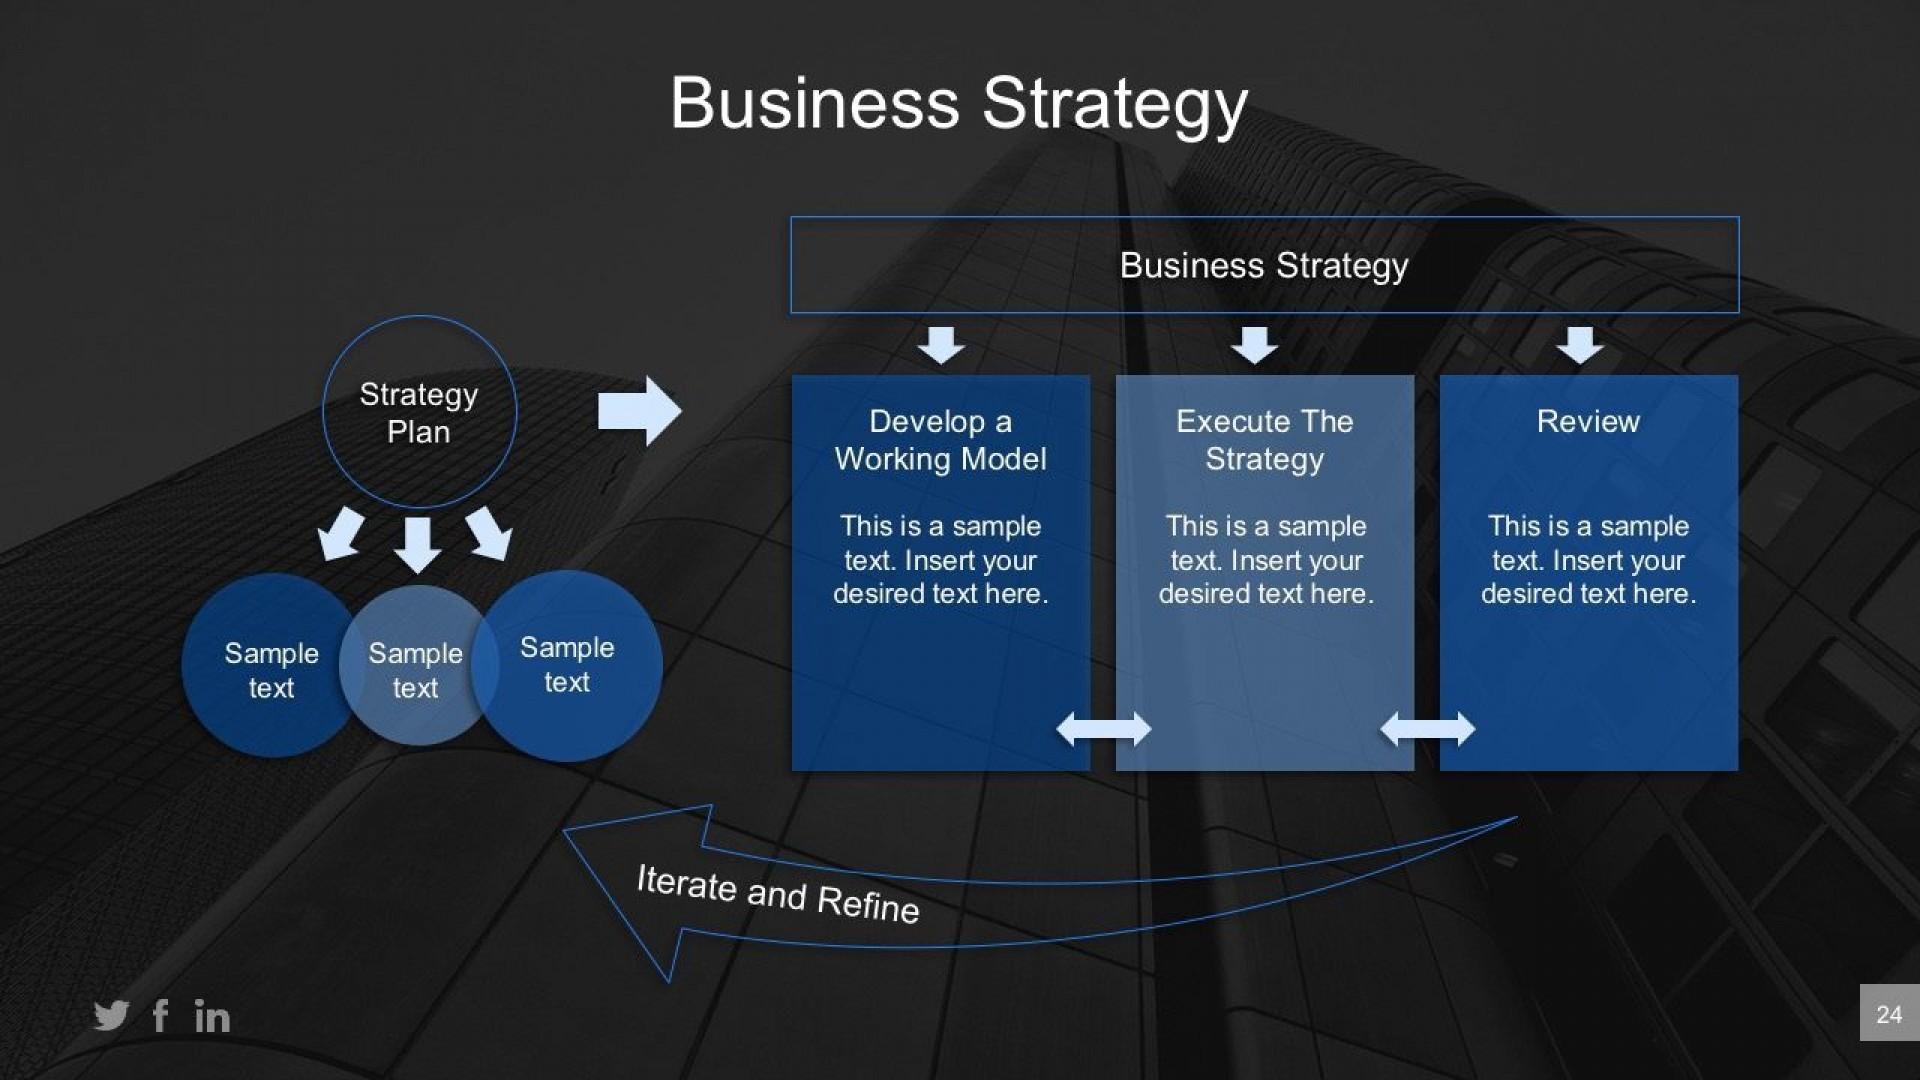 004 Amazing Strategic Planning Template Ppt Idea  Free Download Hr Plan Presentation1920